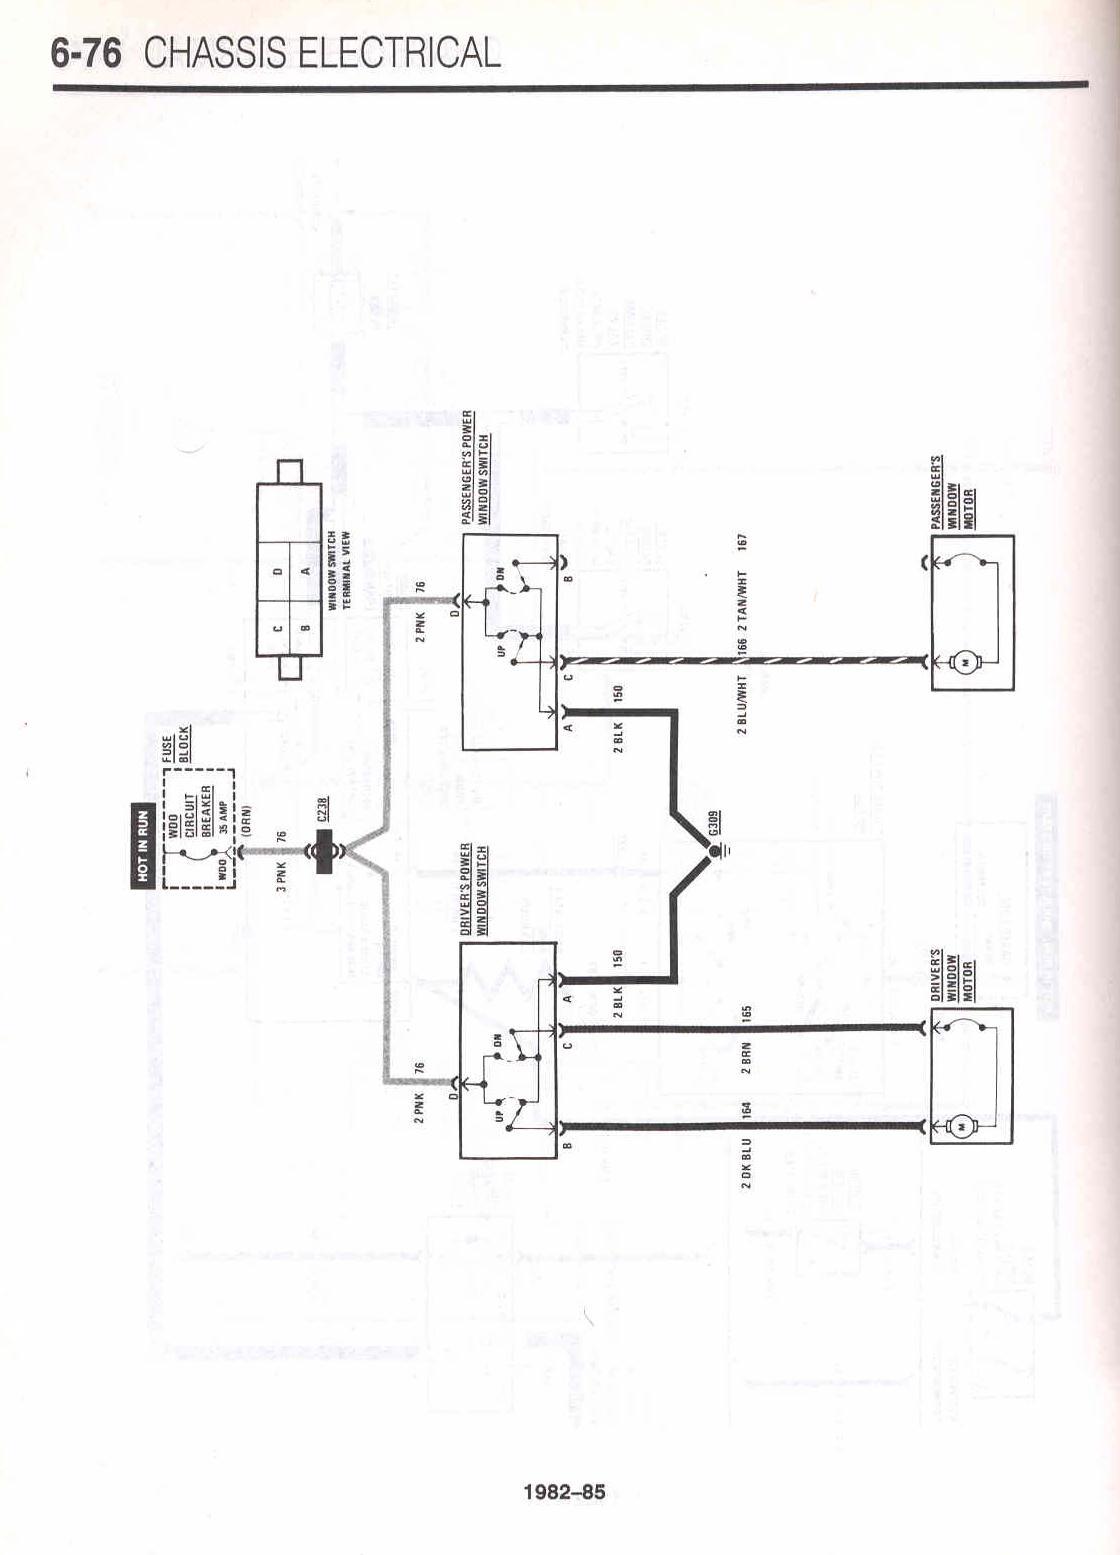 1985 jeep cj7 alternator wiring